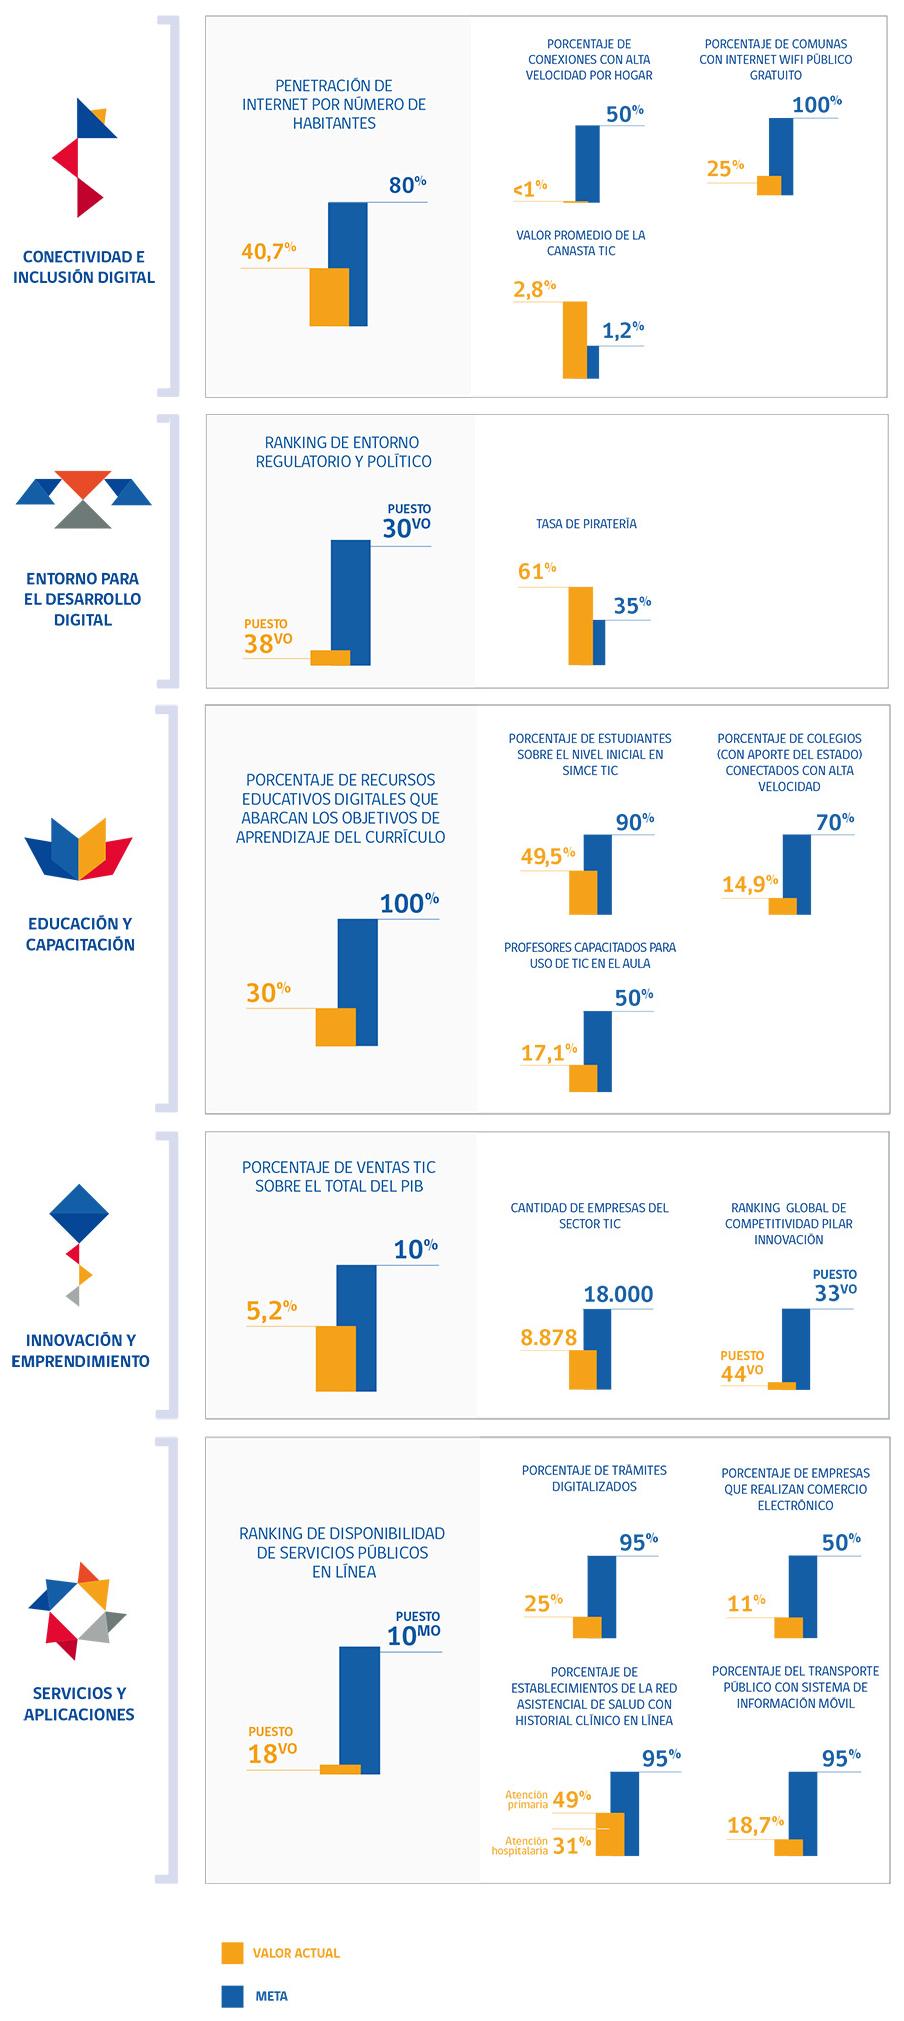 Agenda Digital Chile 2013 – 2020